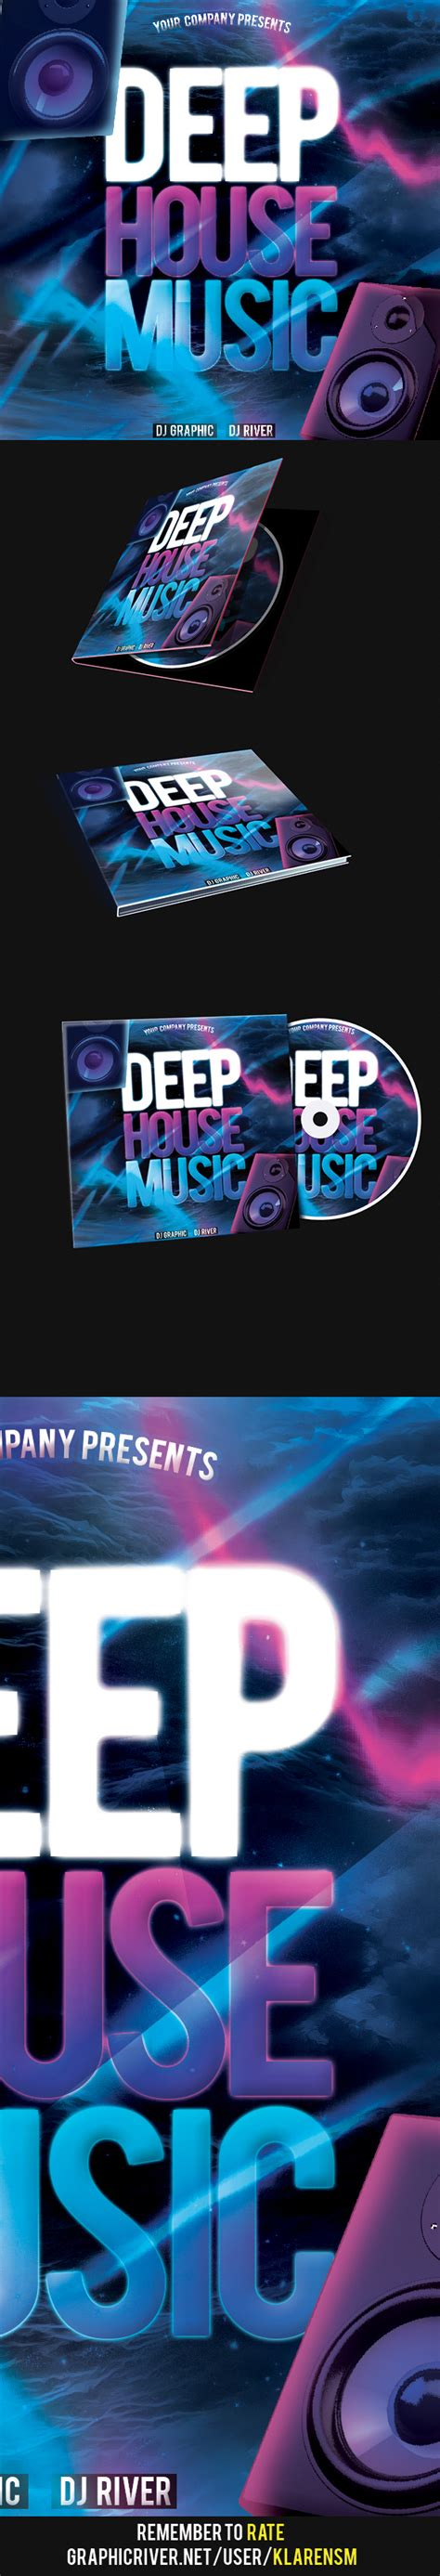 house music cd deep house music cd cover psd template on behance